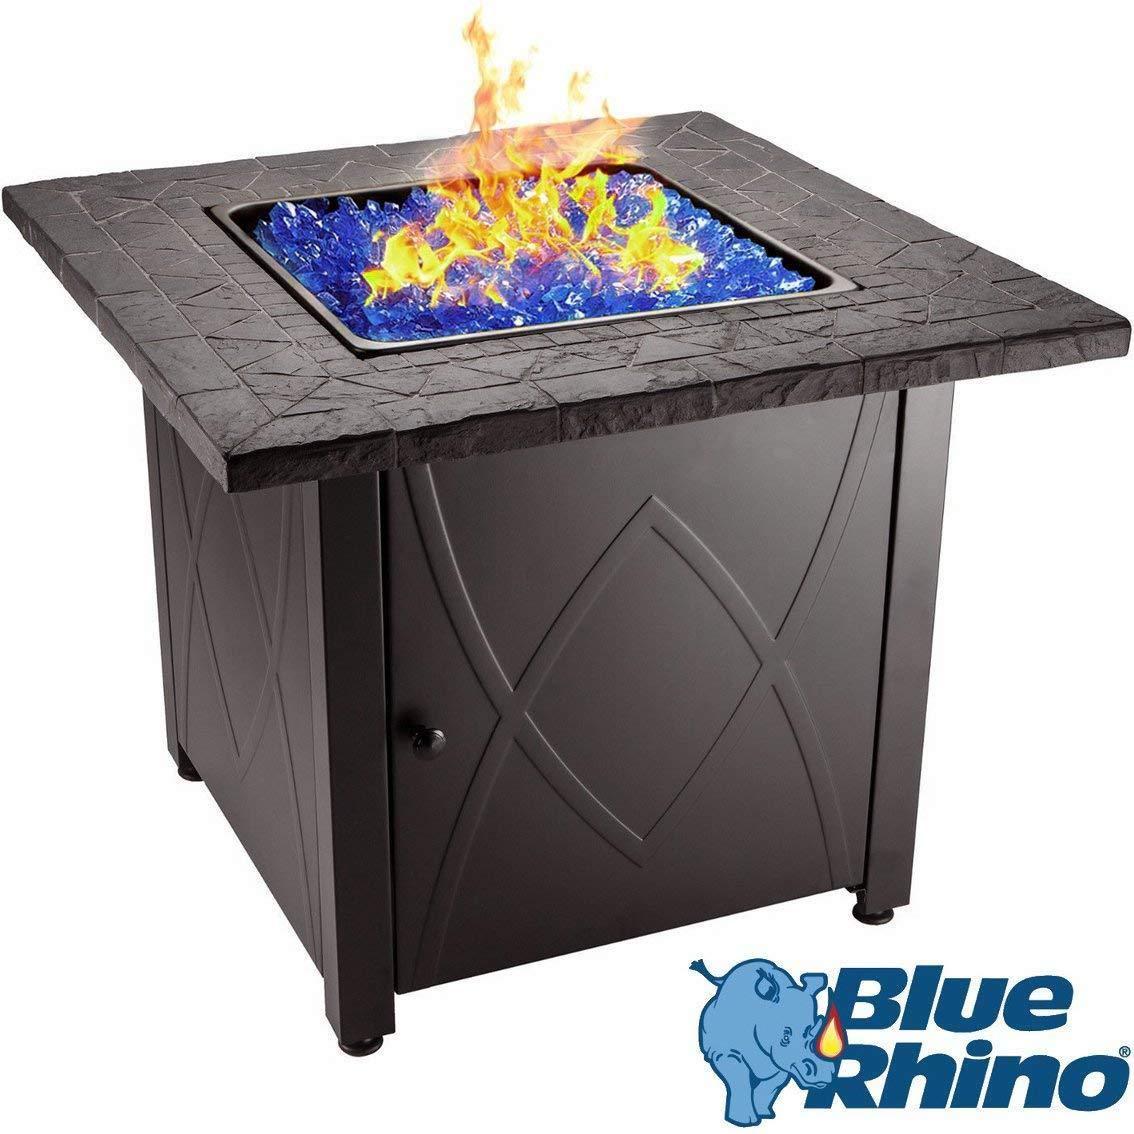 Blue Rhino Outdoor Propane Gas Fire Pit (Blue Fireglass) by Endless Summer